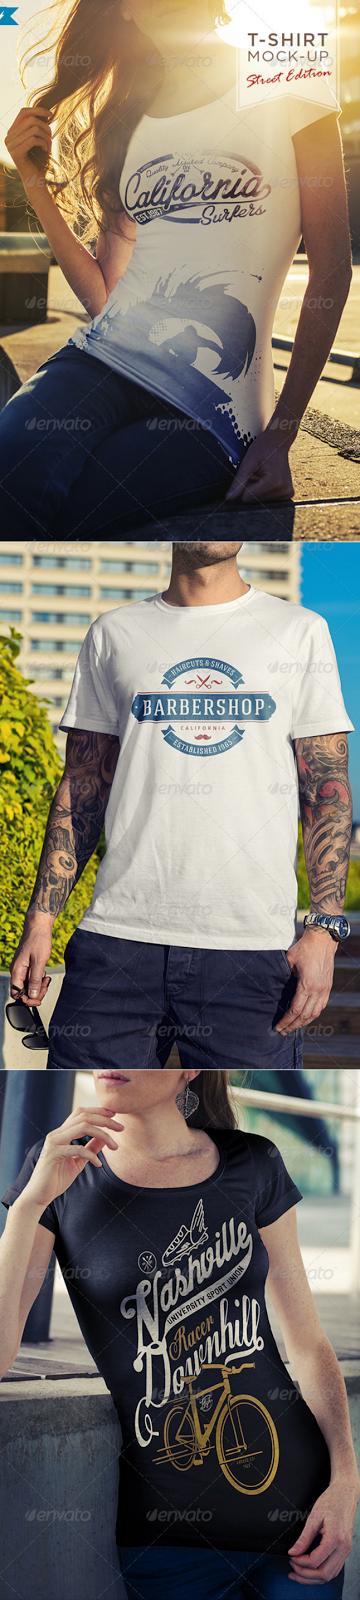 15. T-Shirt Mockup Street Edition